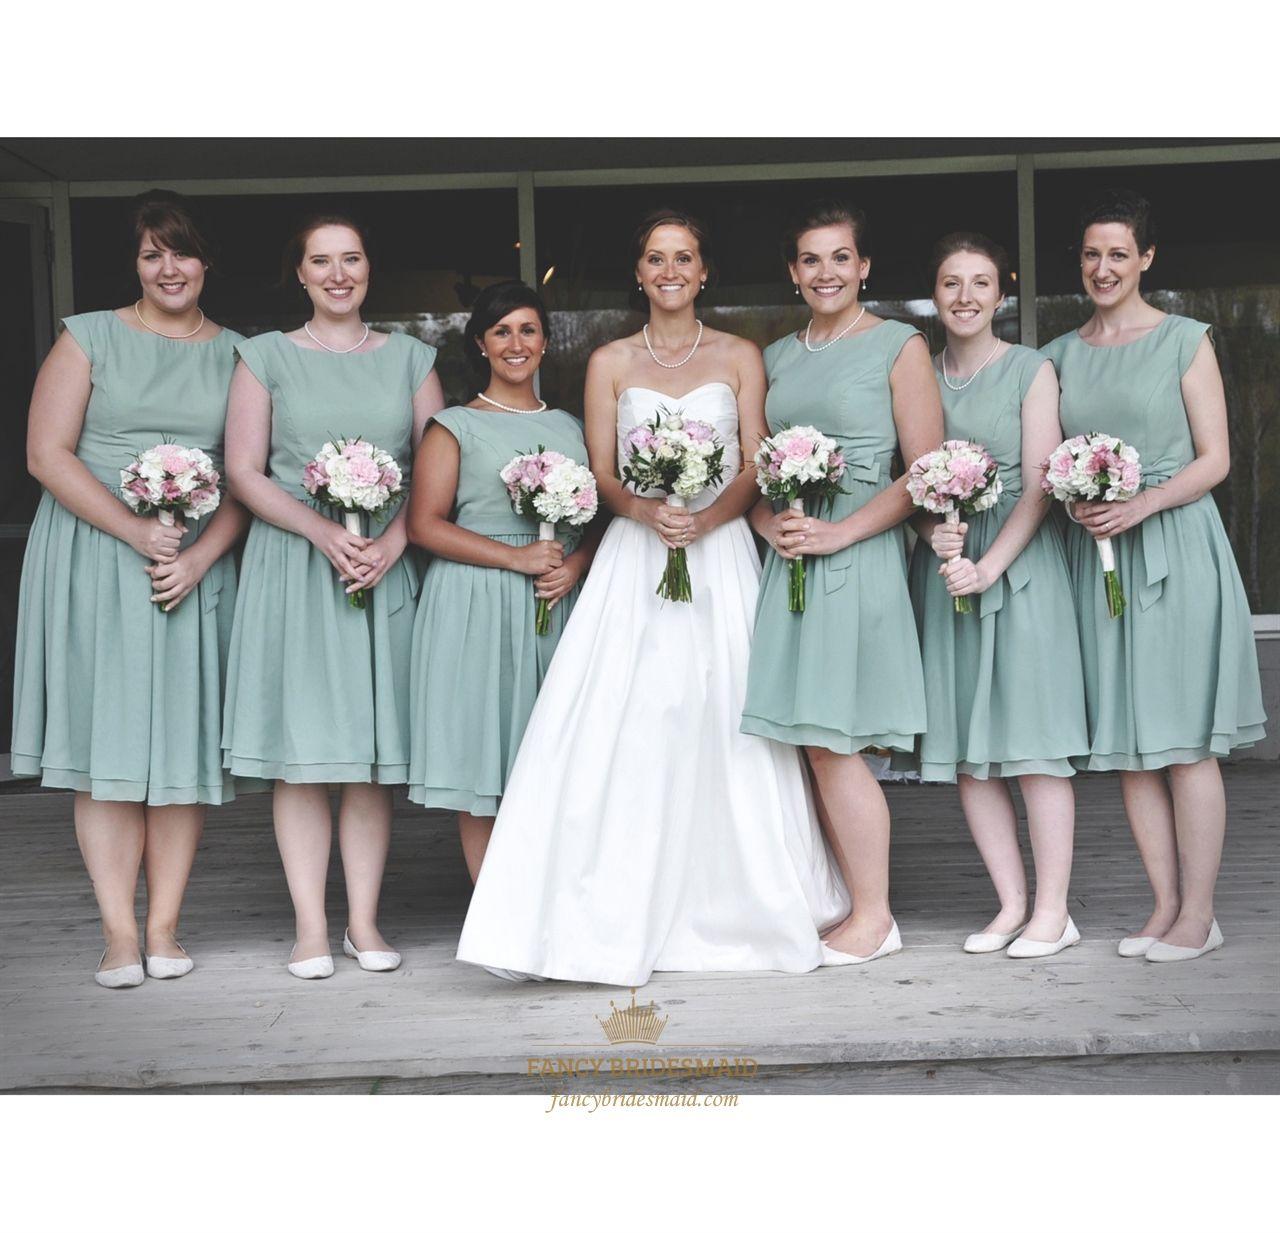 Simple Sage Green Cap Sleeve Chiffon Short Bridesmaid Dress With Sash Sage Bridesmaid Dresses Green Bridesmaid Dresses Short Tea Length Bridesmaid Dresses